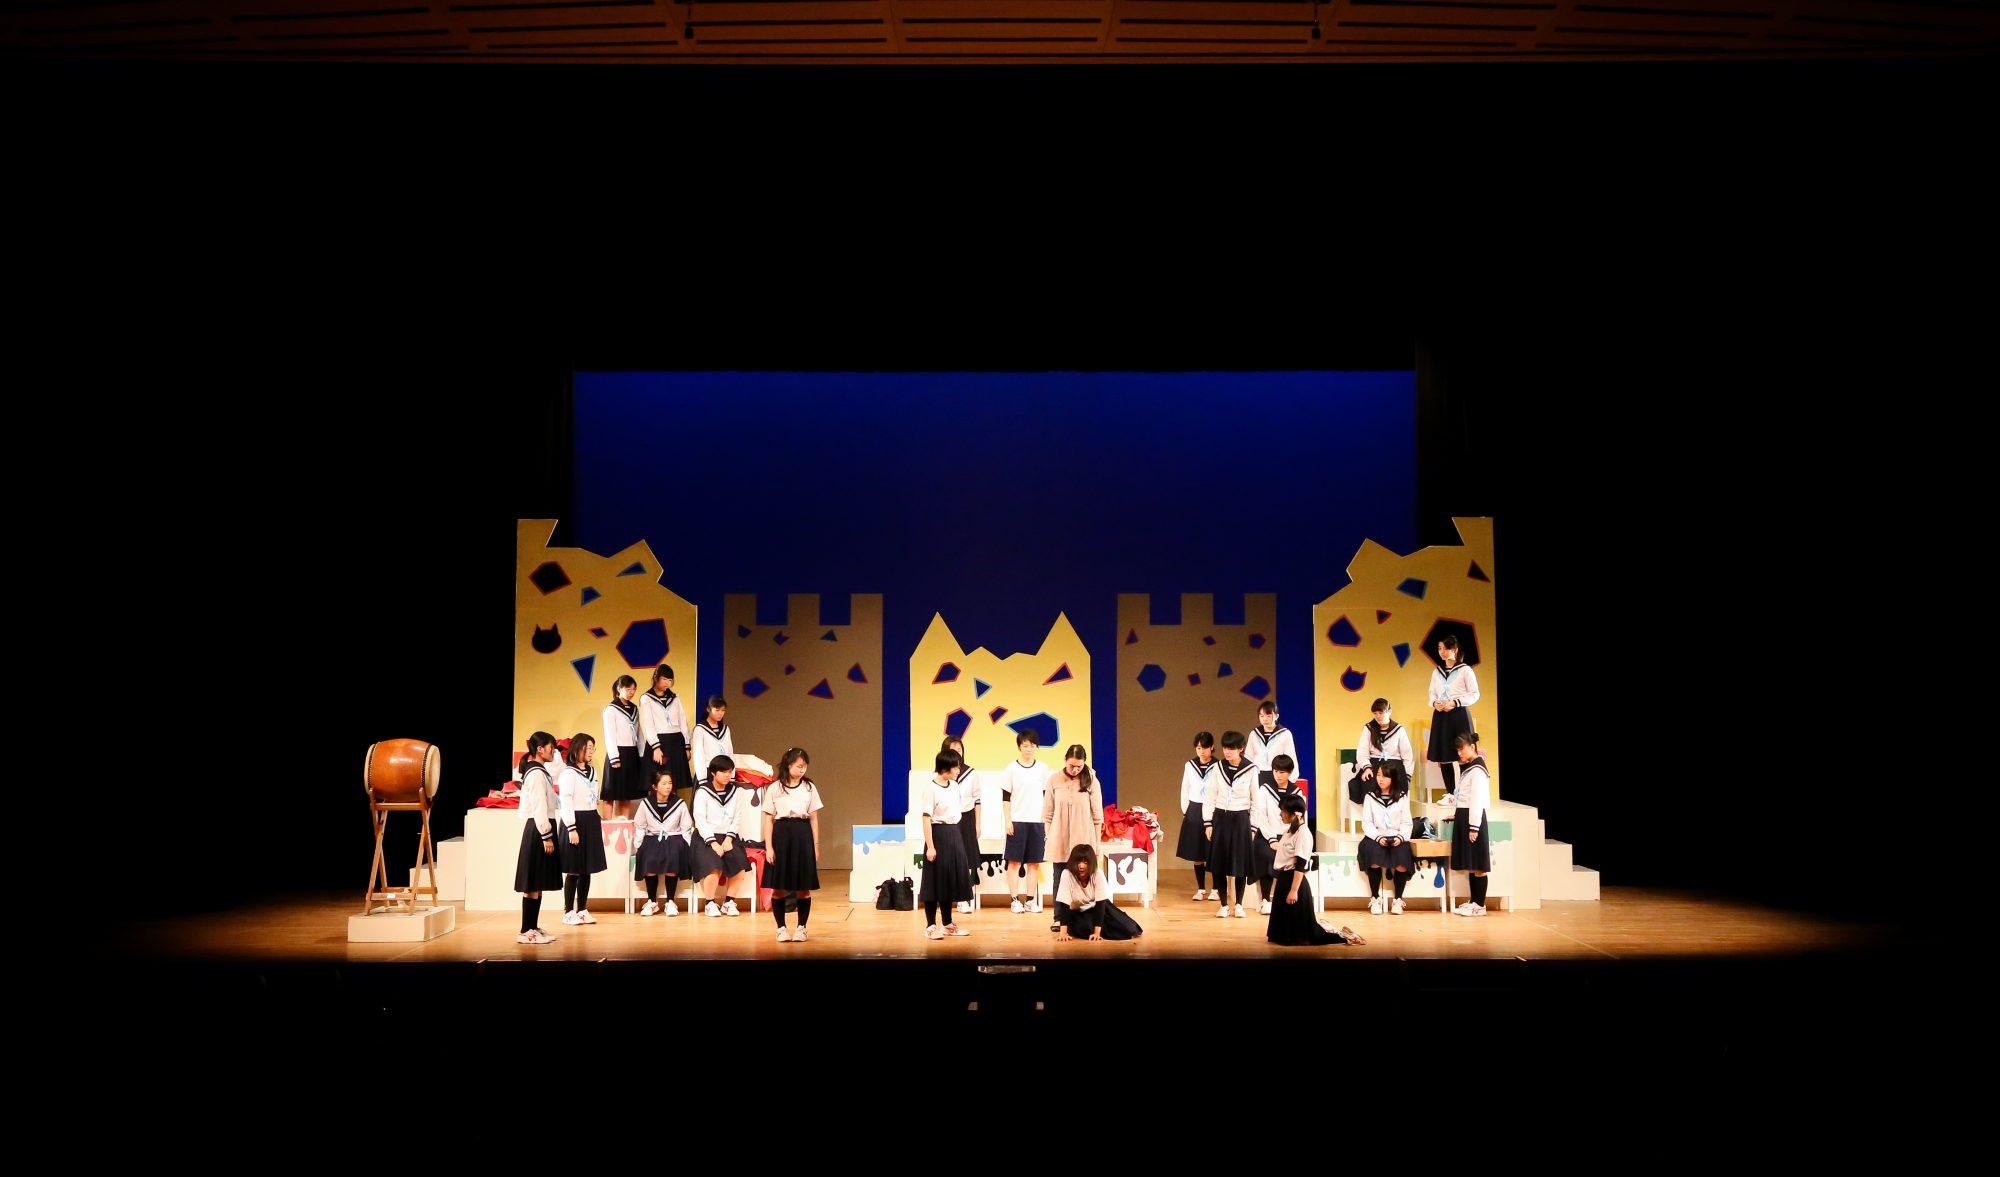 大阪府の高校演劇